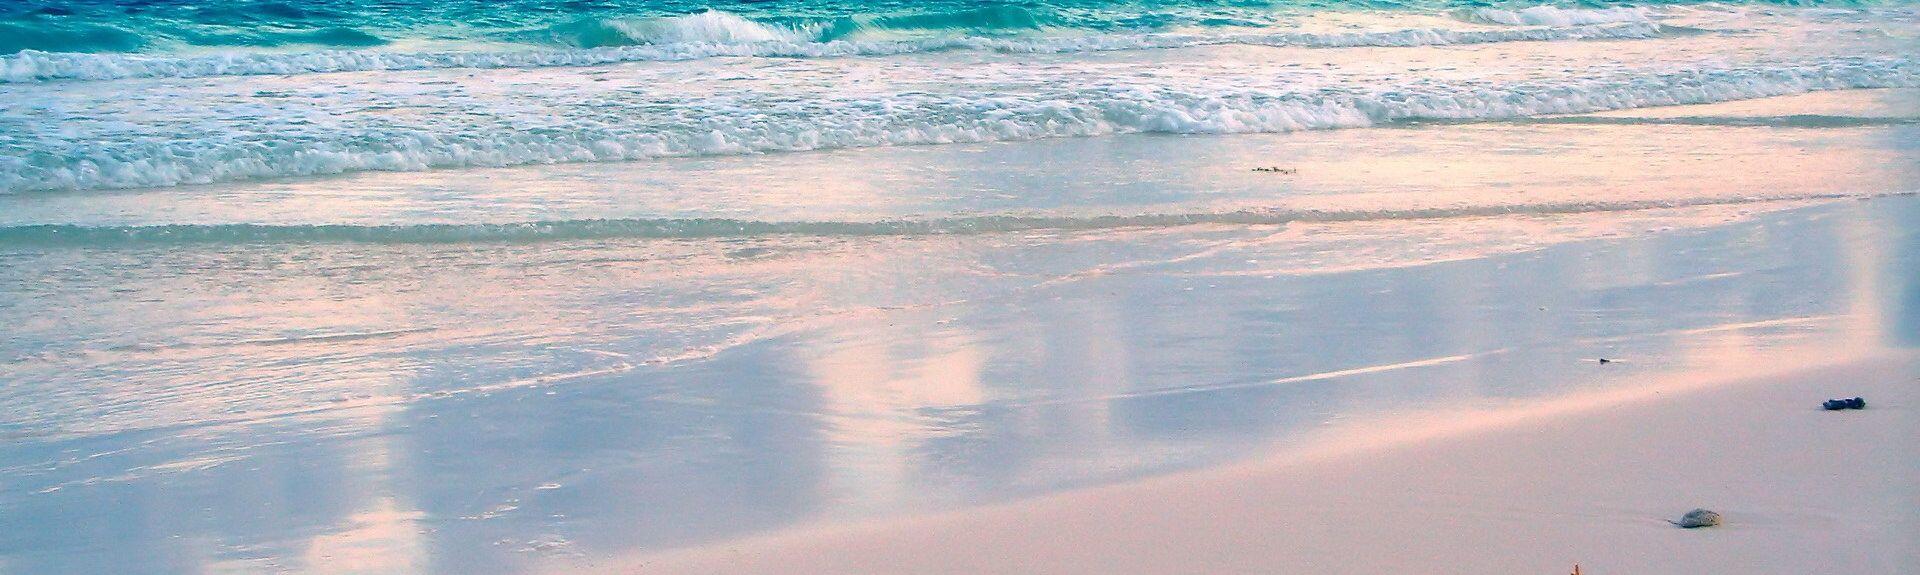 Beachside Villas (Santa Rosa Beach, Florida, United States)